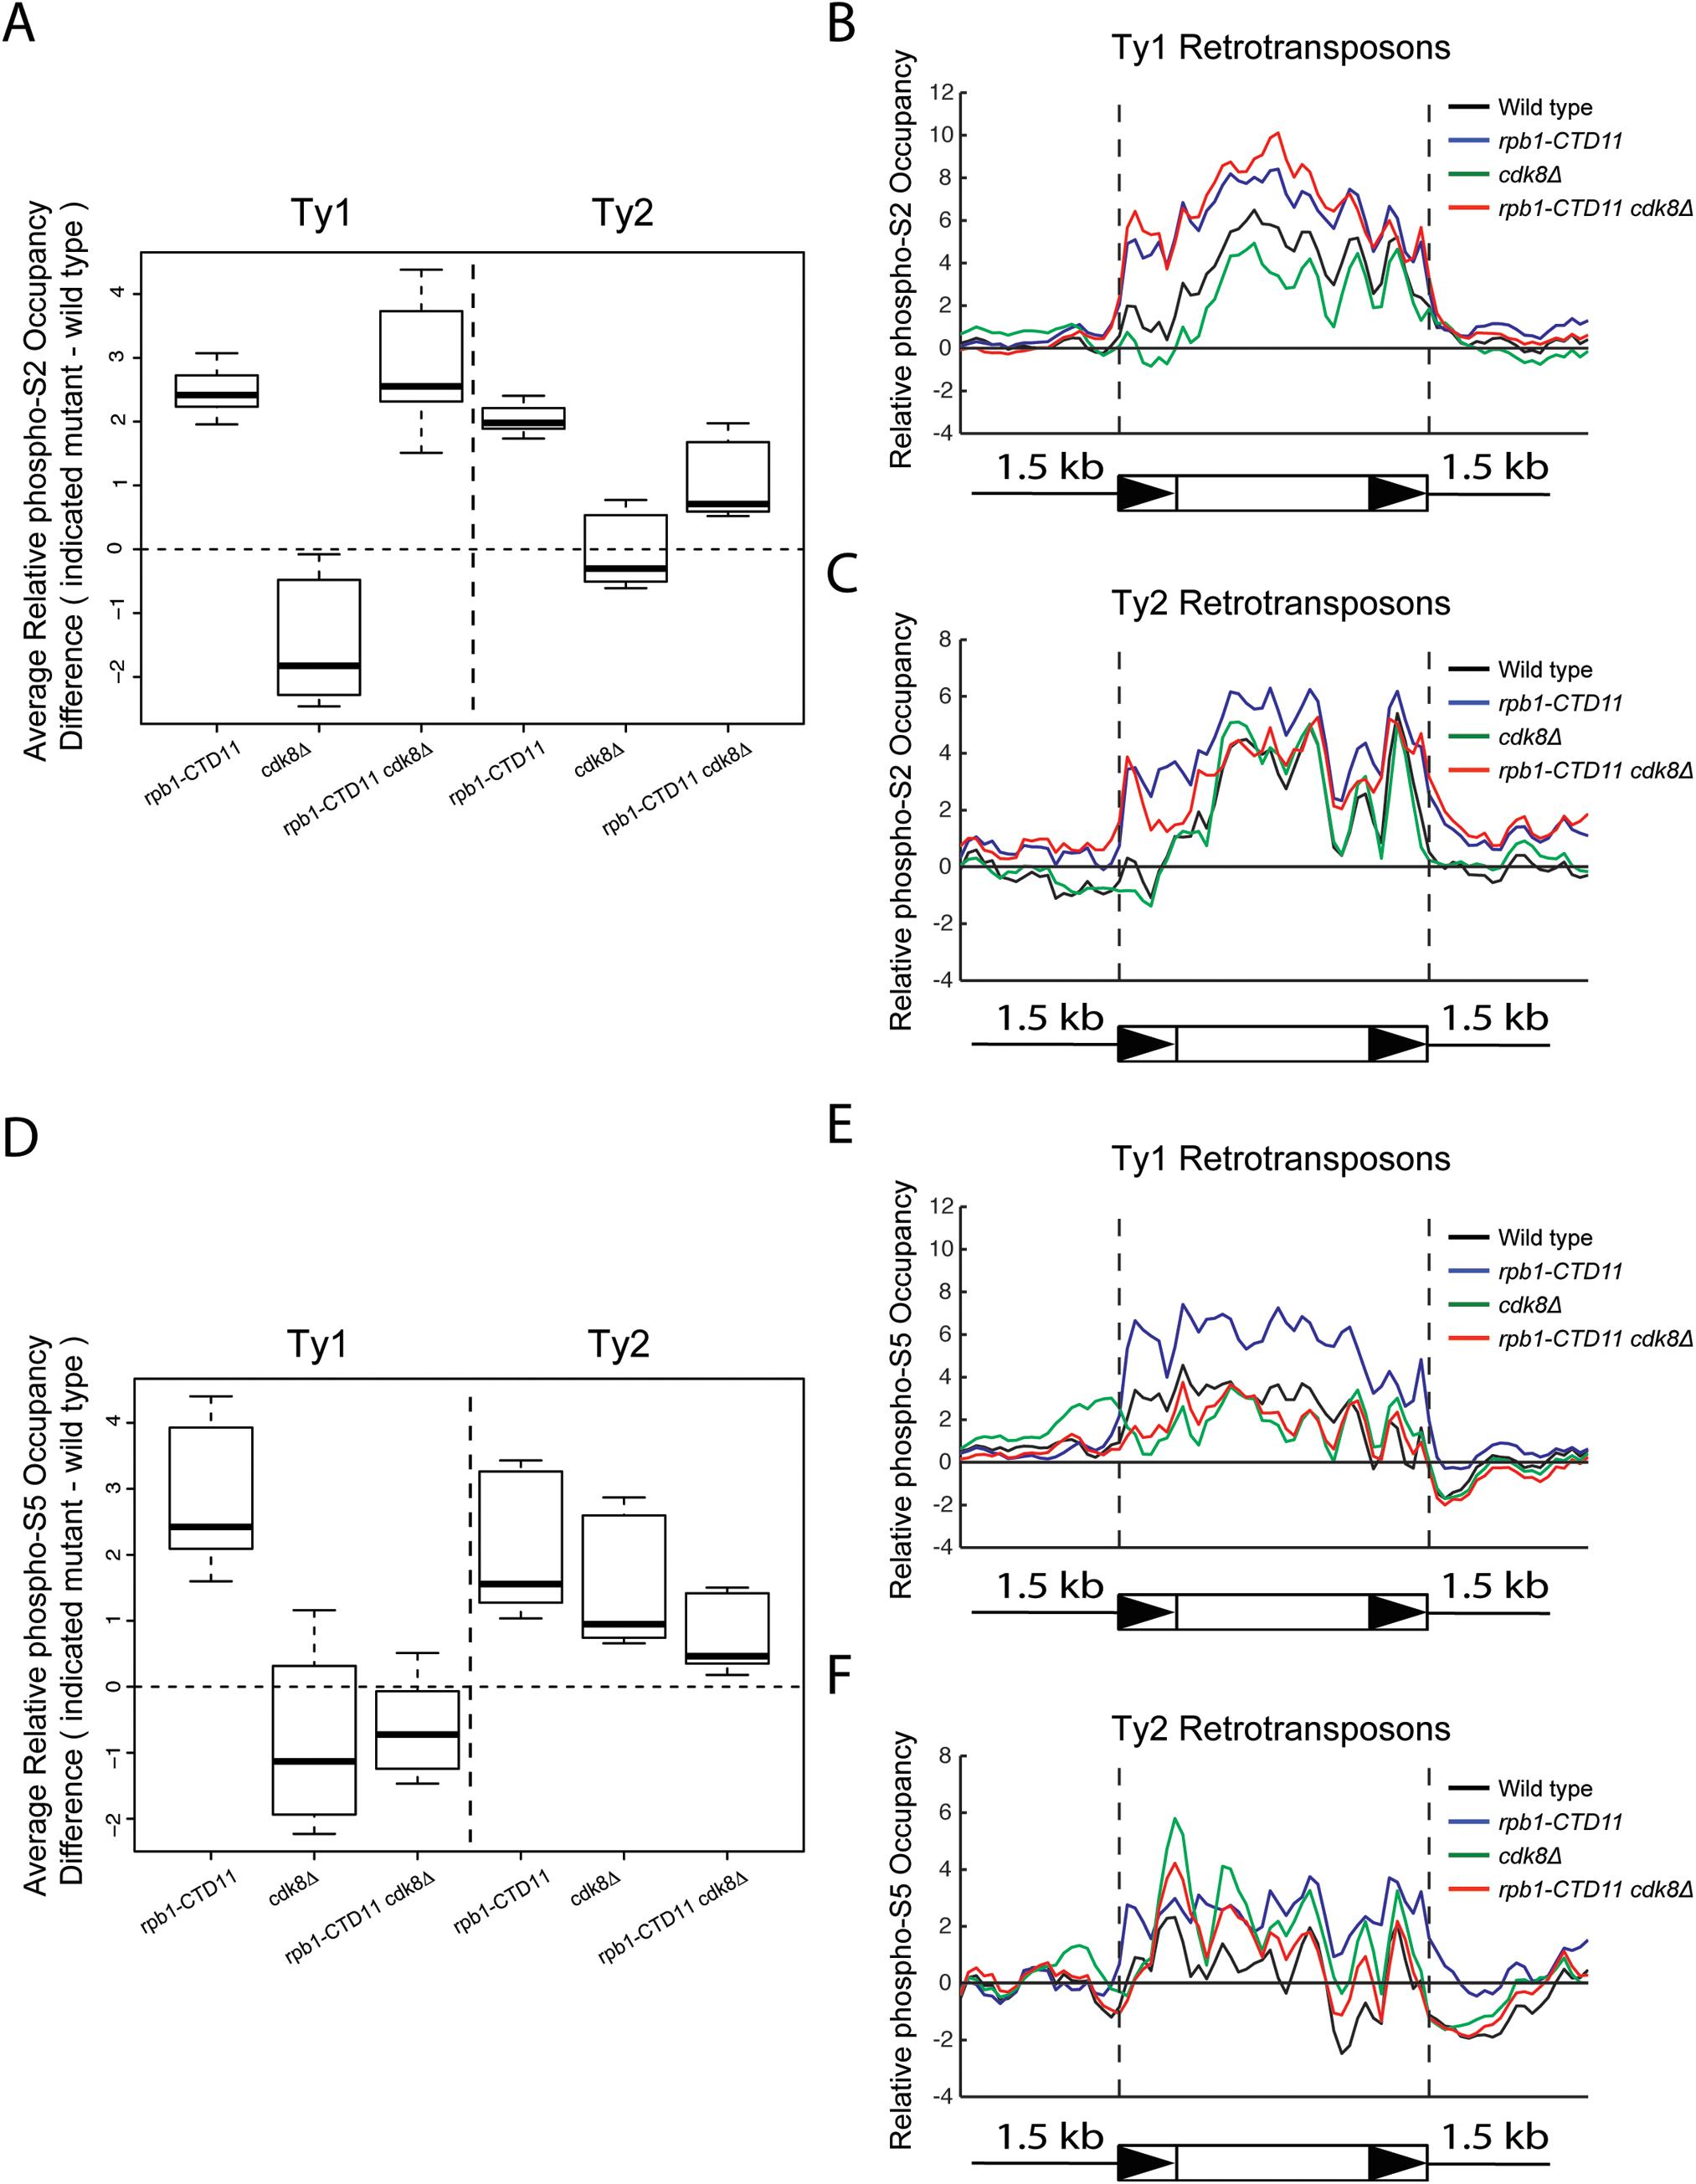 Loss of <i>CDK8</i> decreased the elevated RNAPII-CTD S<sub>5</sub> phosphorylation levels at Ty1 retrotransposons observed in the <i>rpb1-CTD11</i> mutant.